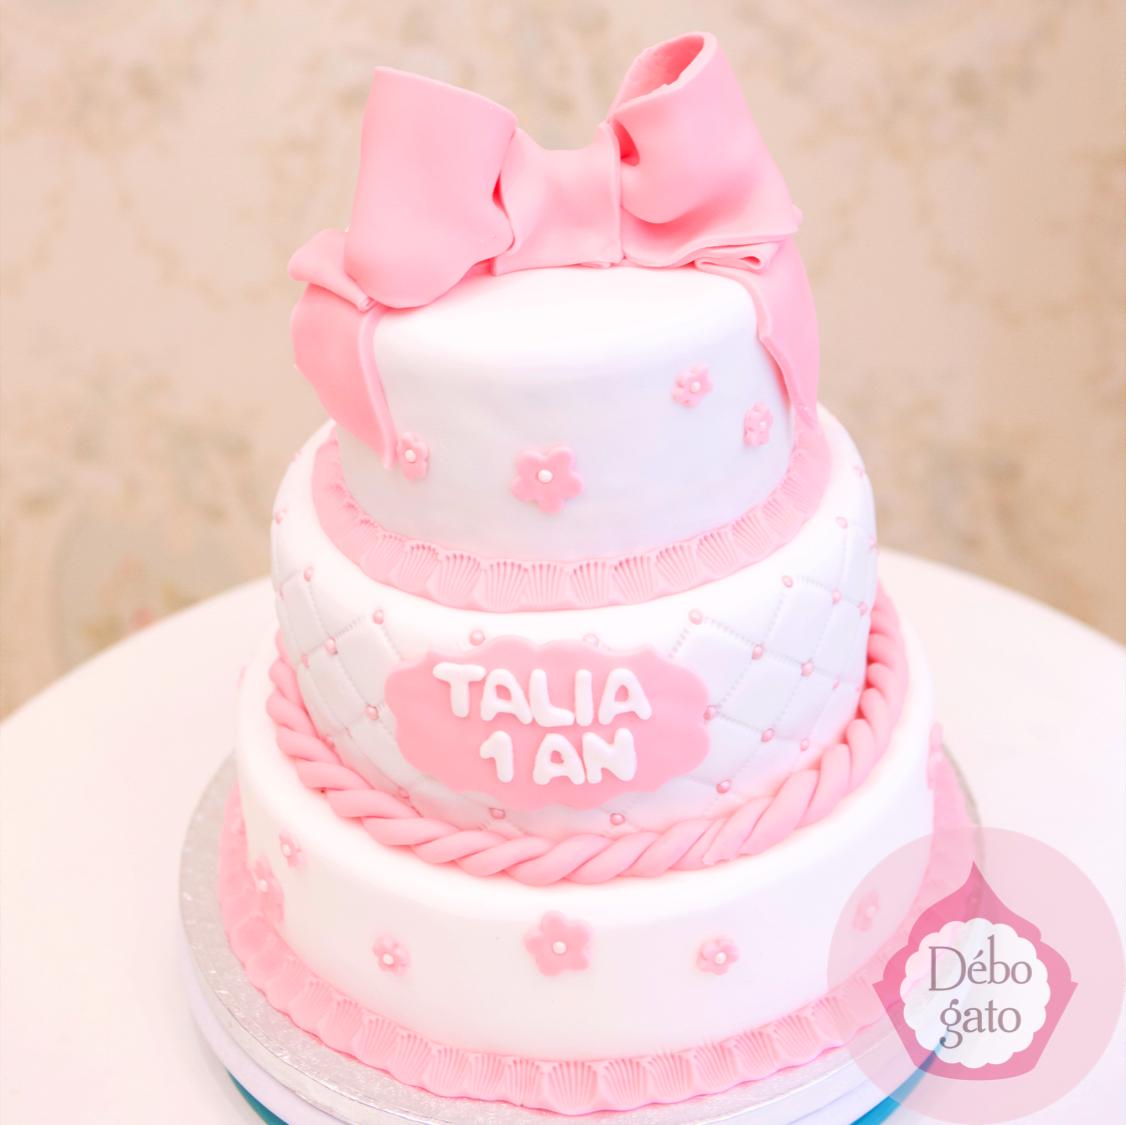 Pièce montée, Roses, Pastel, Rose,Blanc, Cérémonie, Mariage Wedding Cake